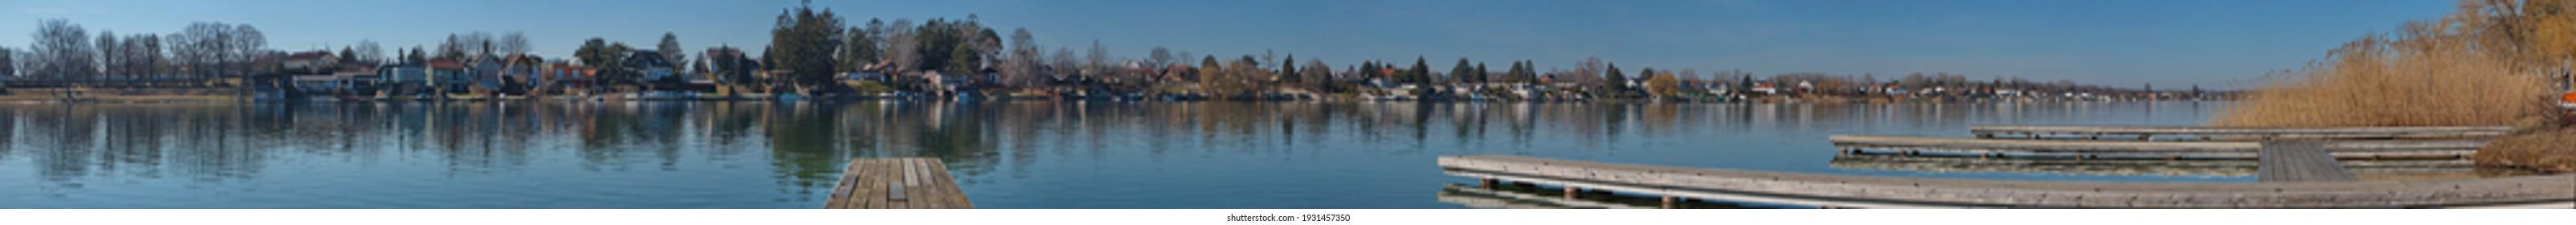 Panoramic view of Neufelder Lake in Neufeld an der Leitha, Burgenland, Austria, Europe  - Shutterstock ID 1931457350